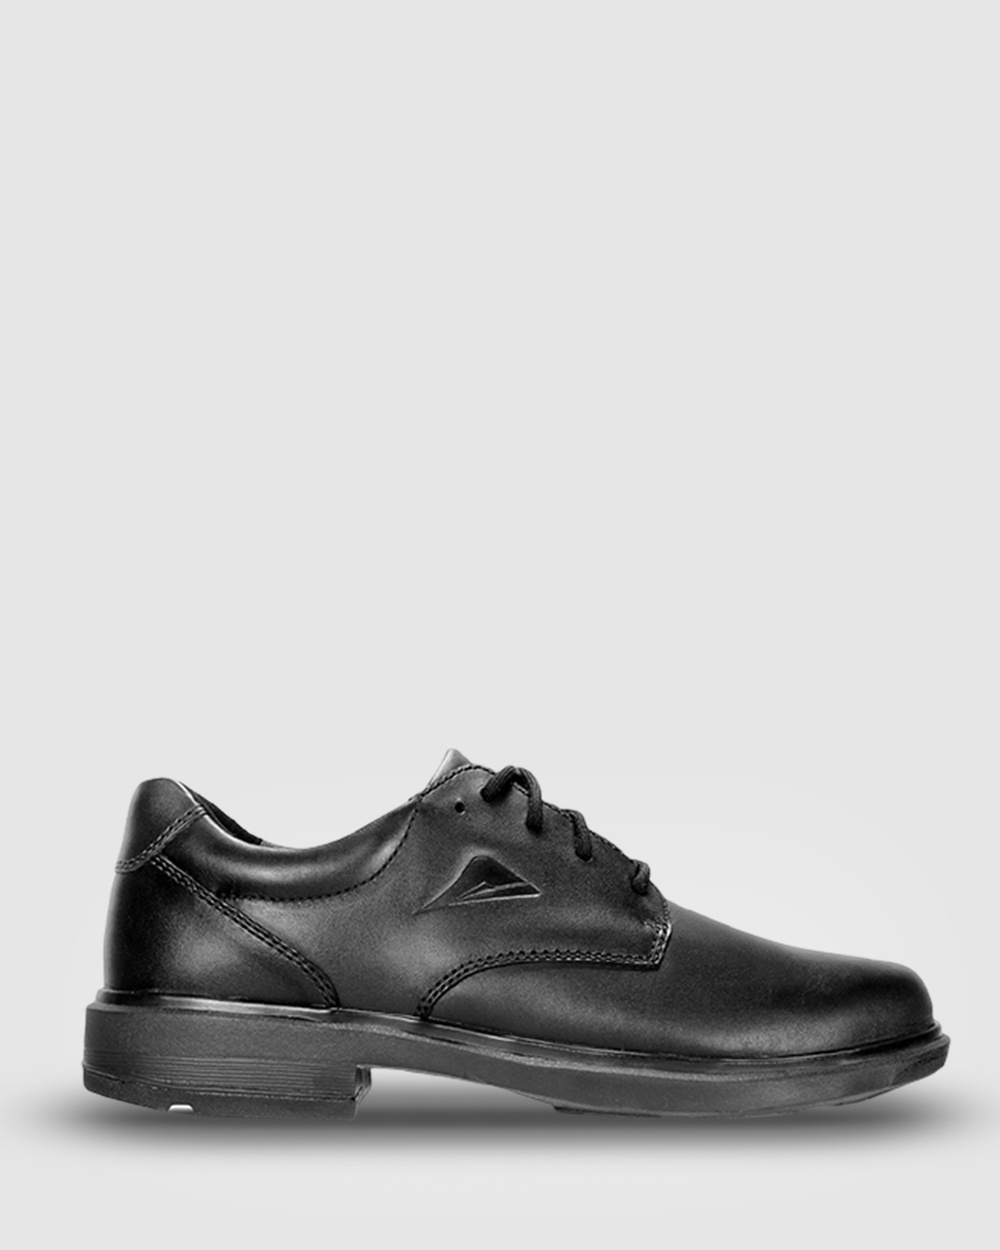 Ascent Apex Max 3 E Width School Shoes Black Australia